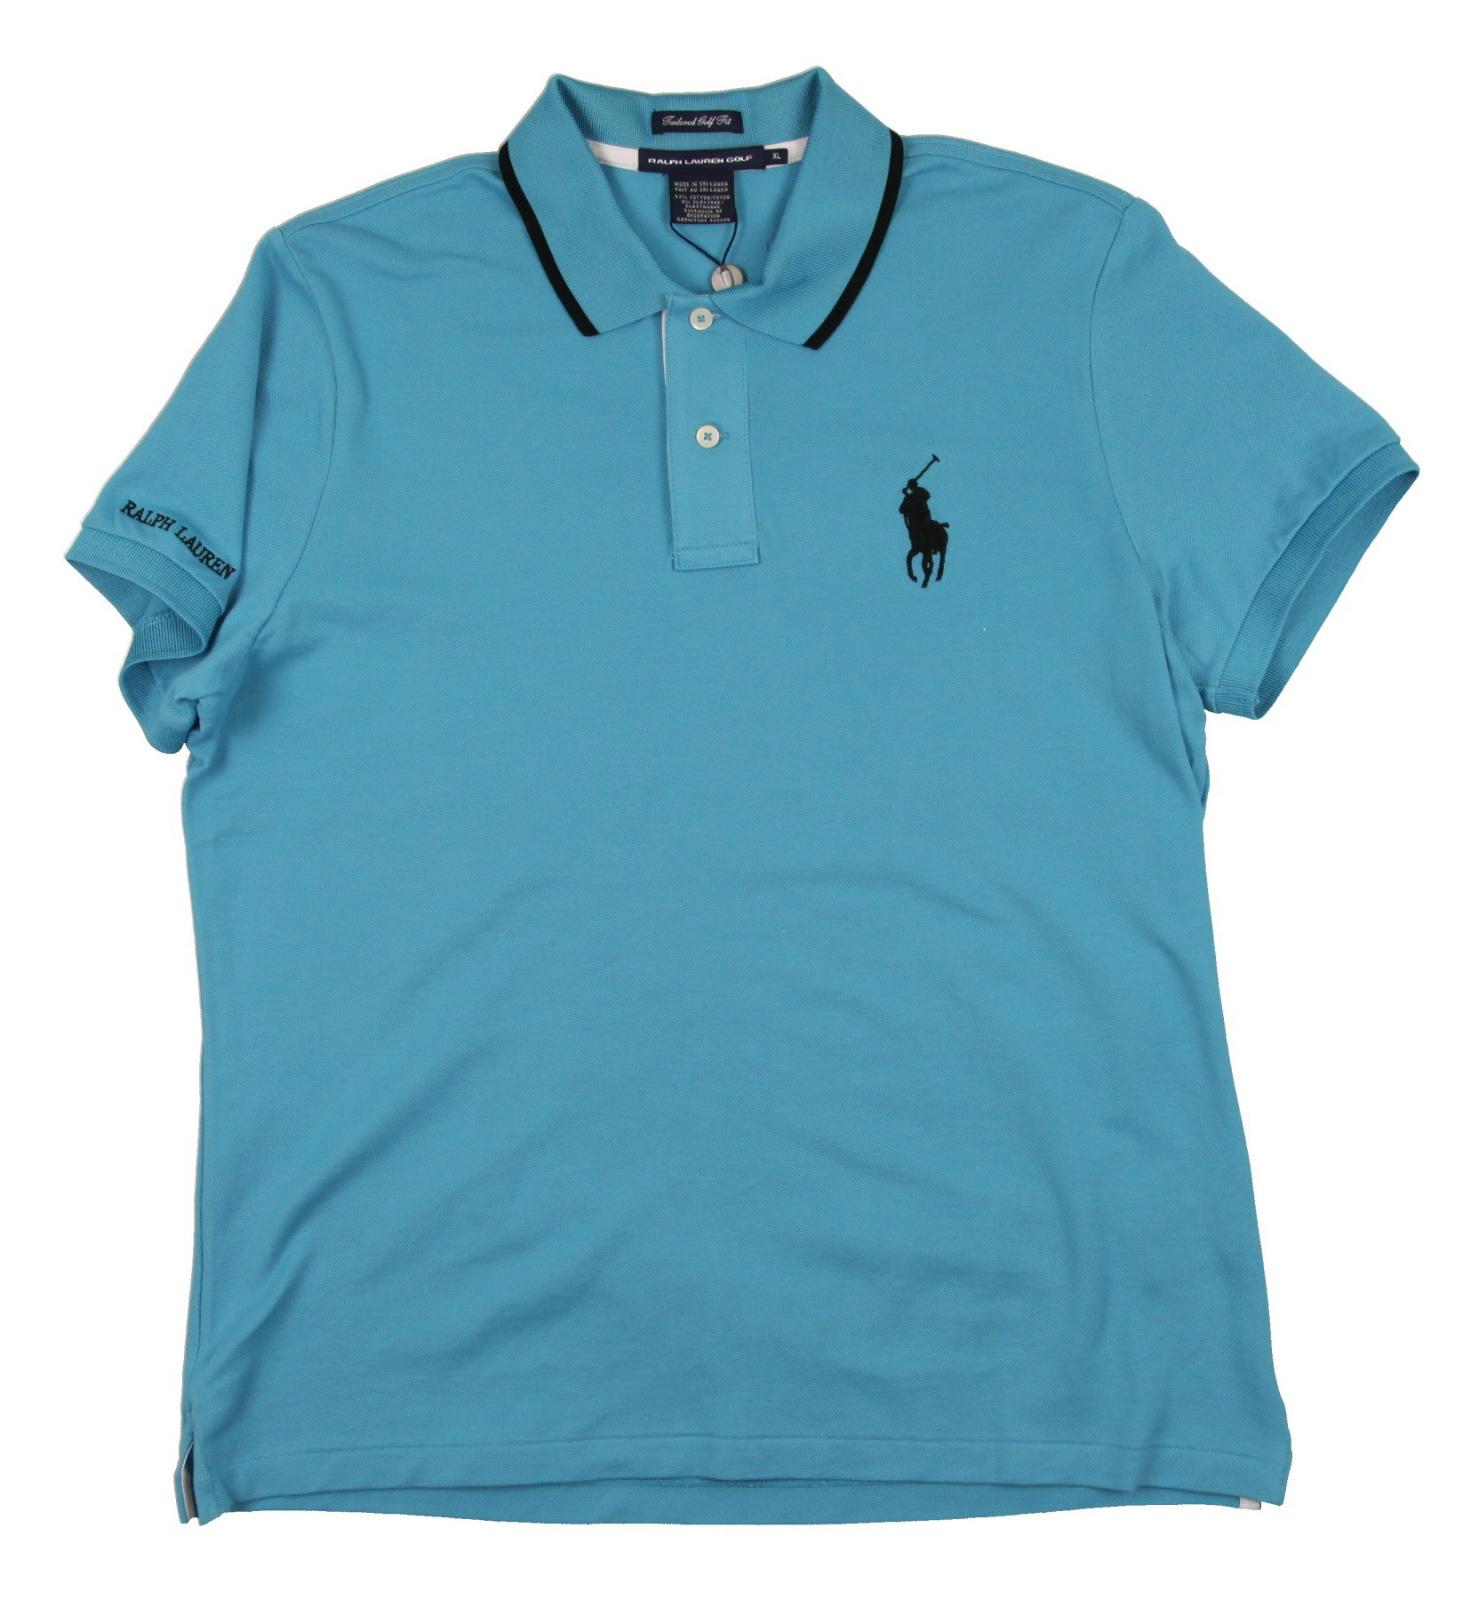 new women 039 s ralph lauren polo golf tailored fit golf. Black Bedroom Furniture Sets. Home Design Ideas